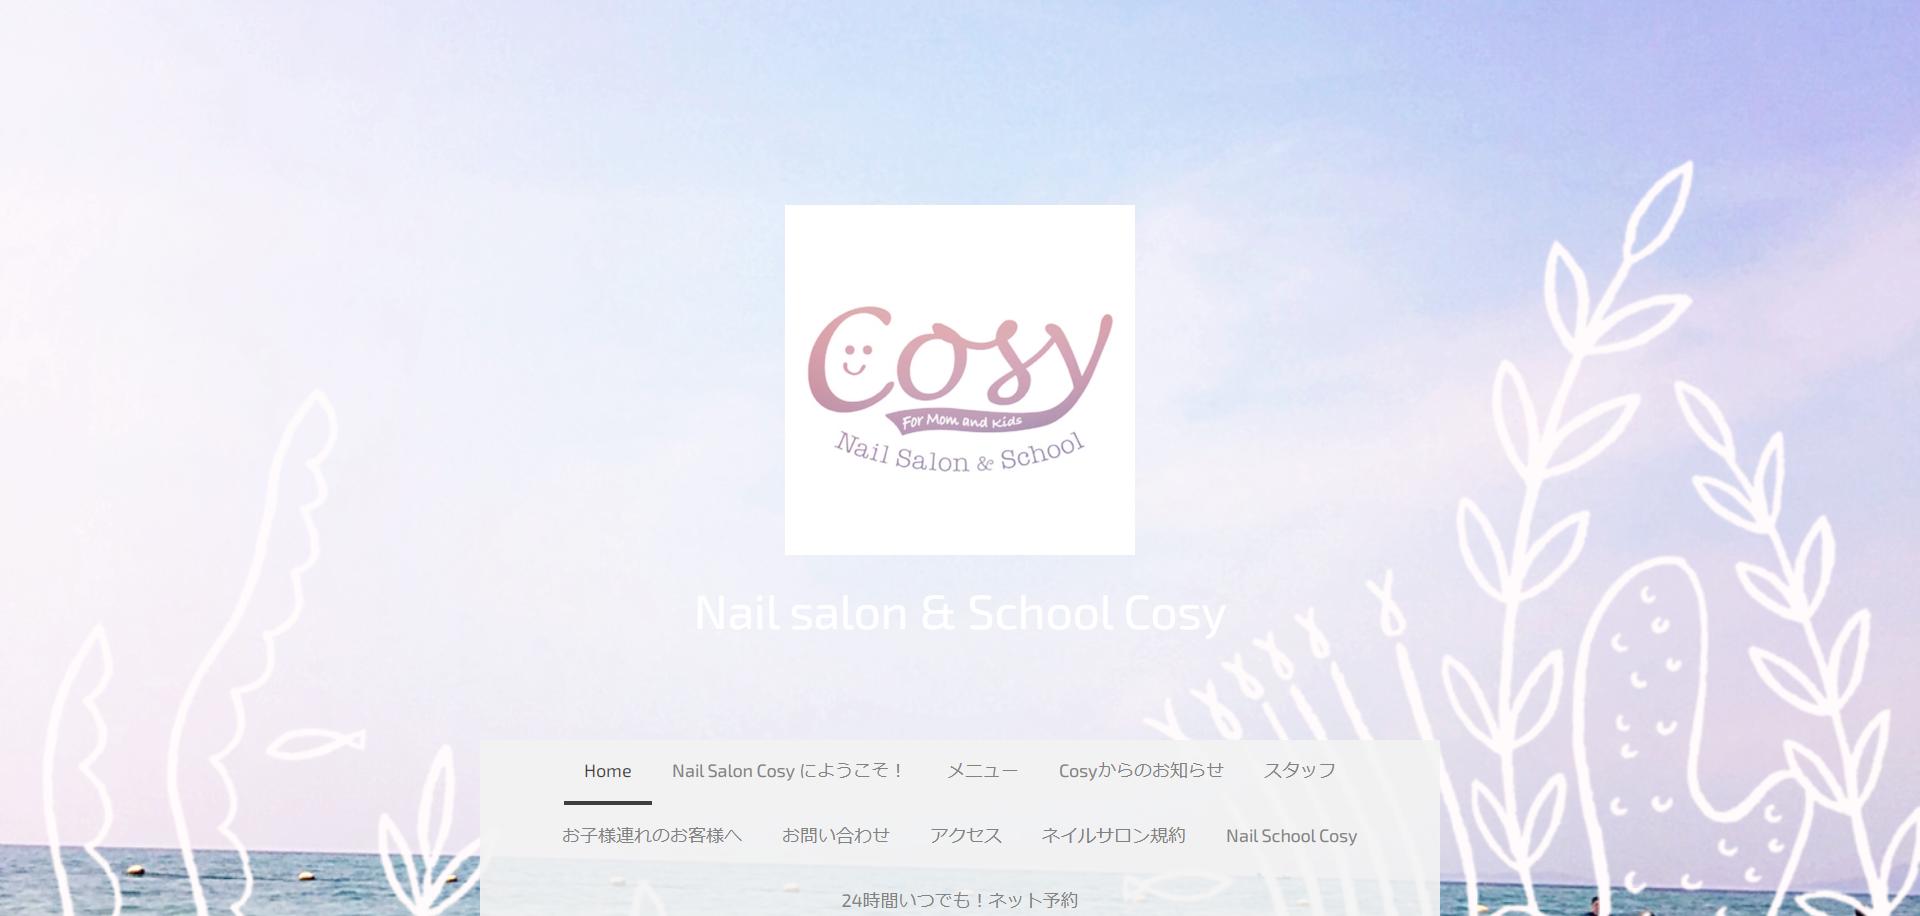 Cosy(コーズィ)